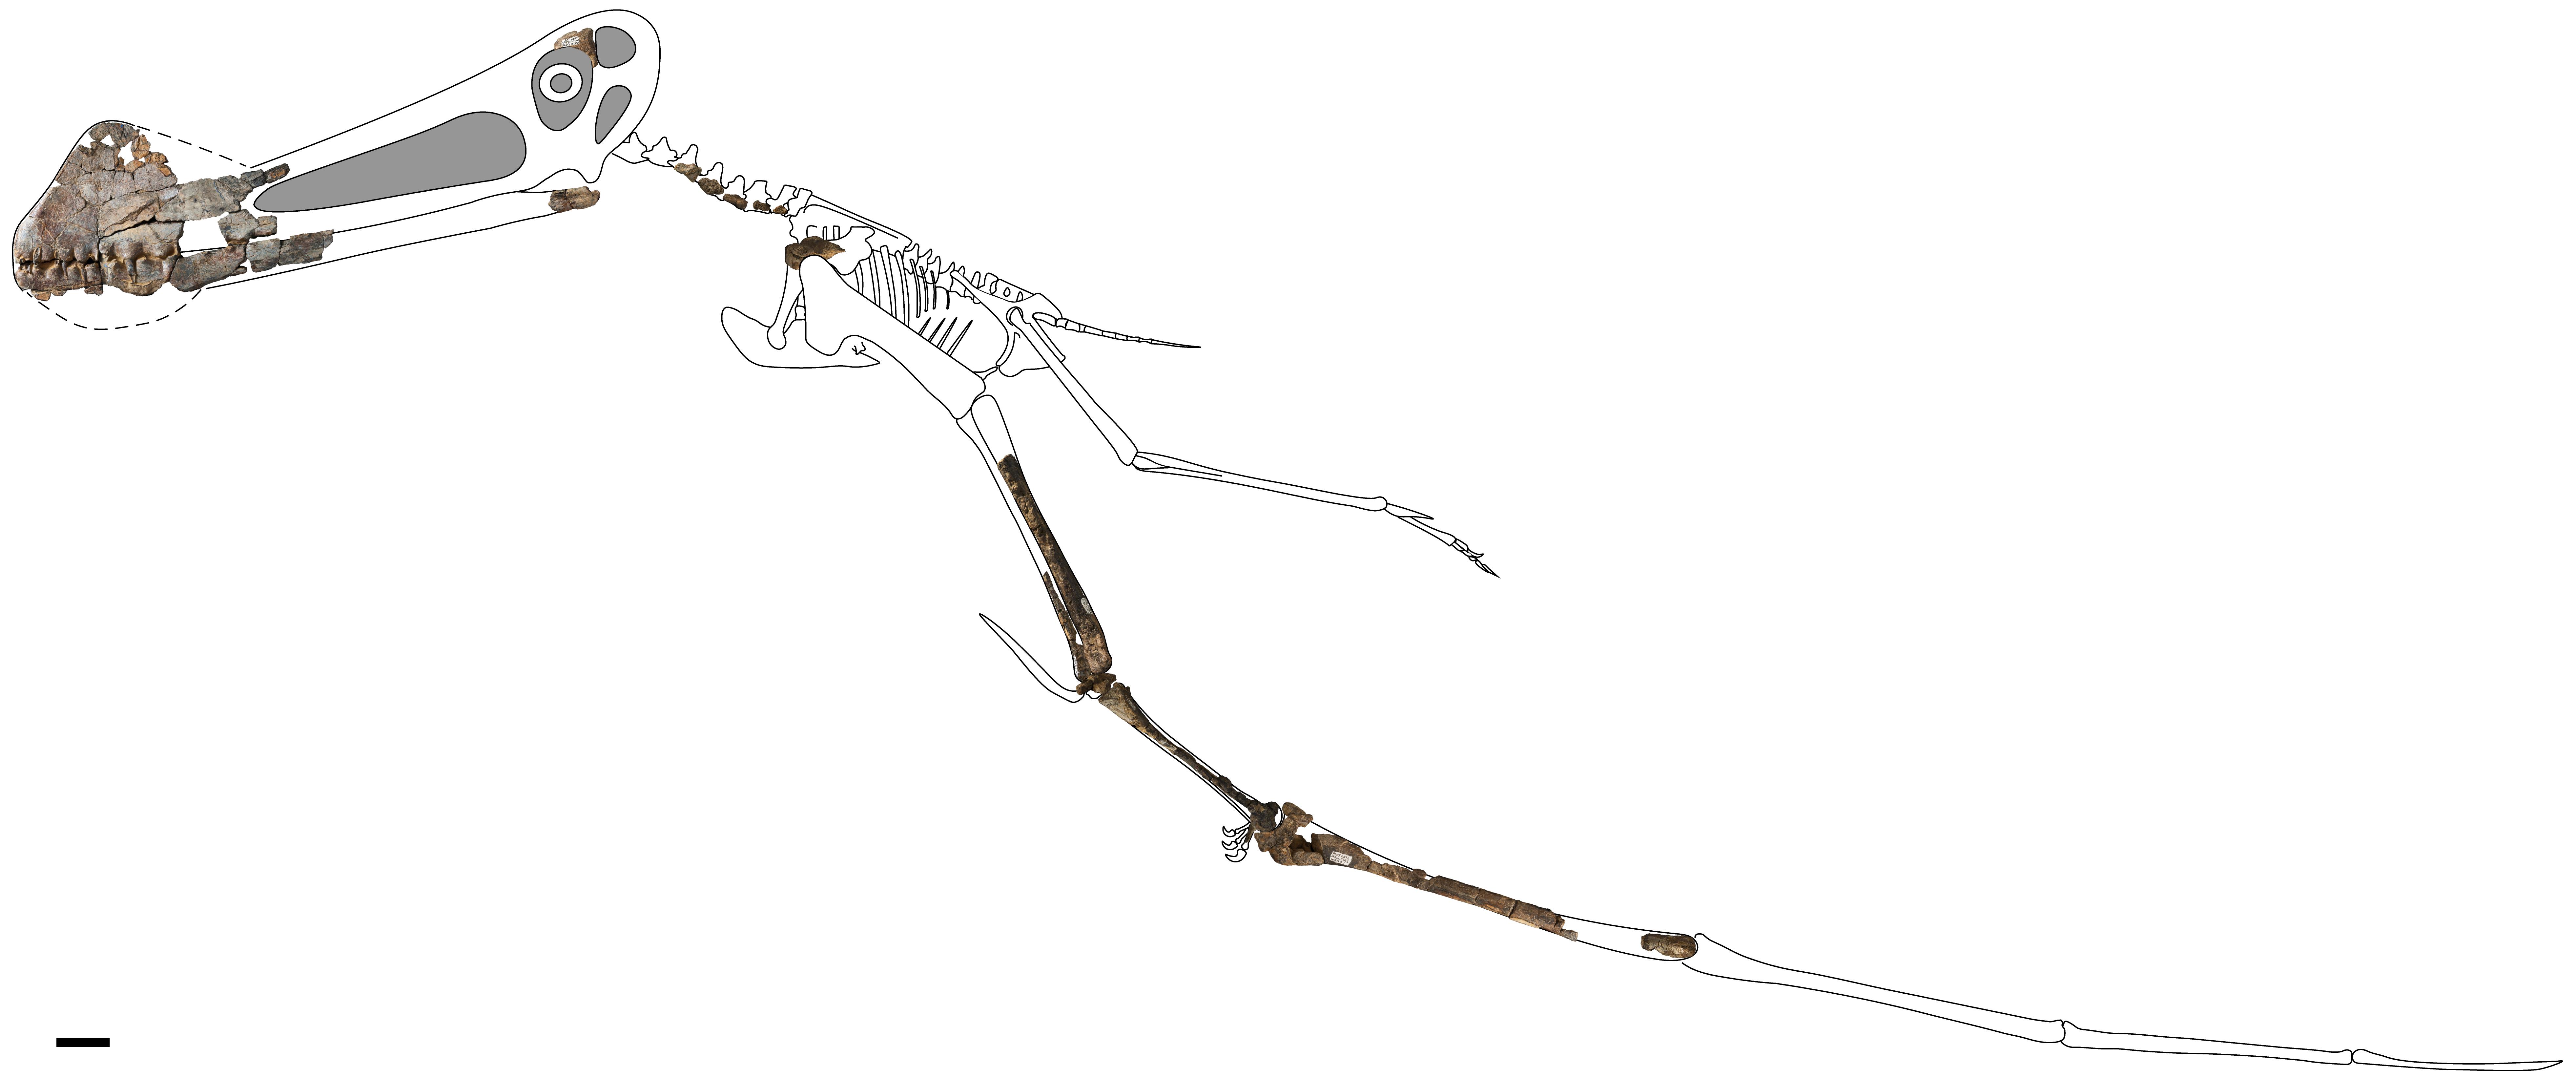 Skeletal reconstruction of a Ferrodraco lentoni